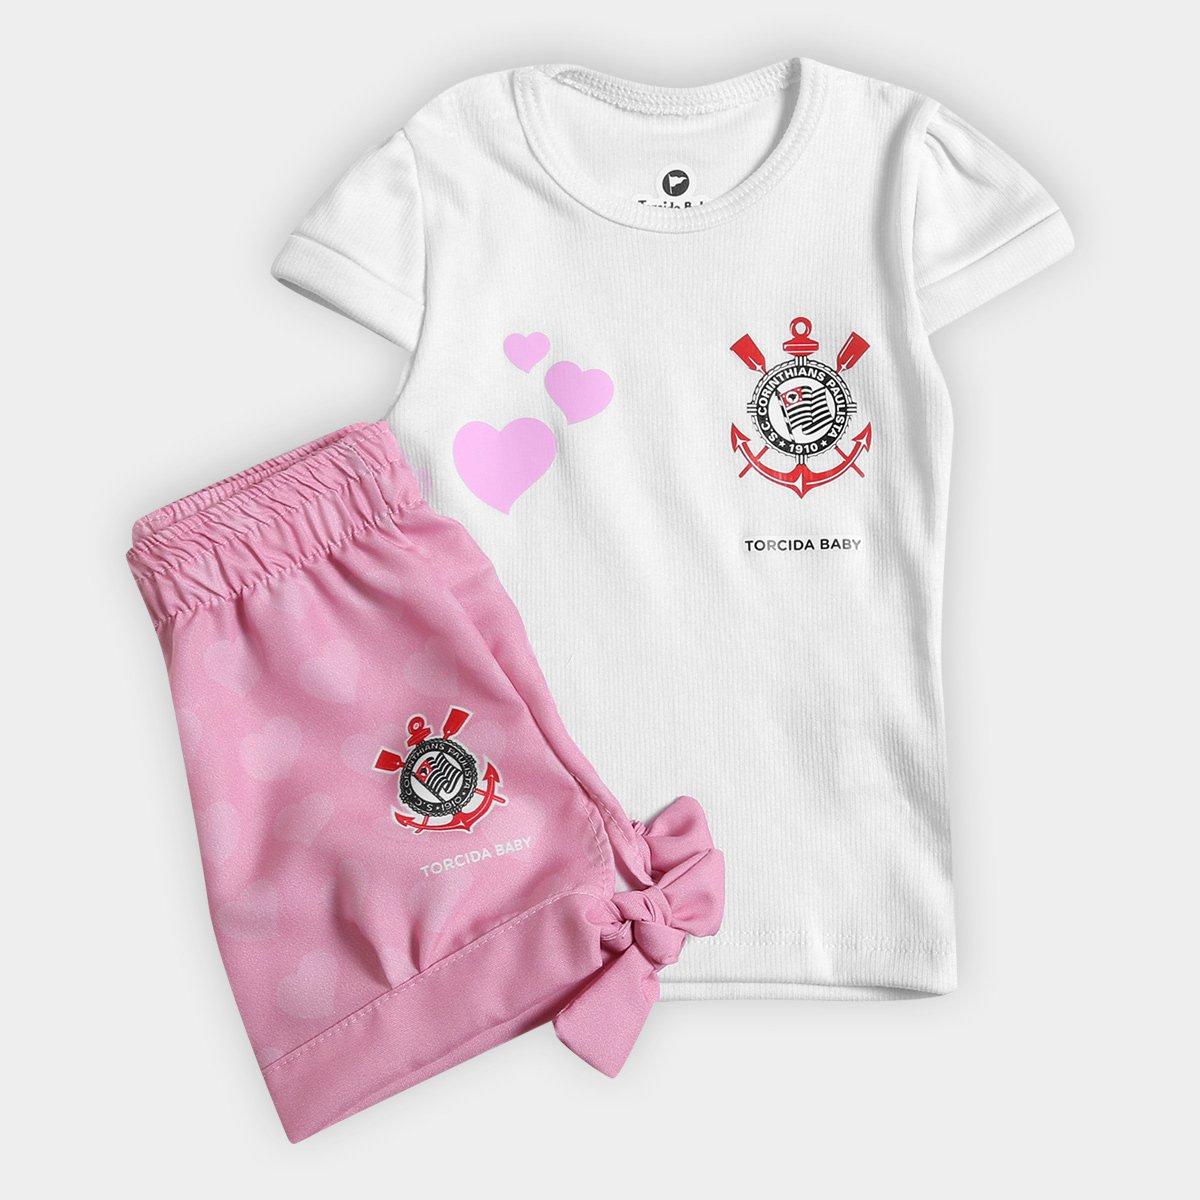 Conjunto Corinthians Infantil Torcida Baby Estilo II Bebê - Compre Agora  0c8d90408853a